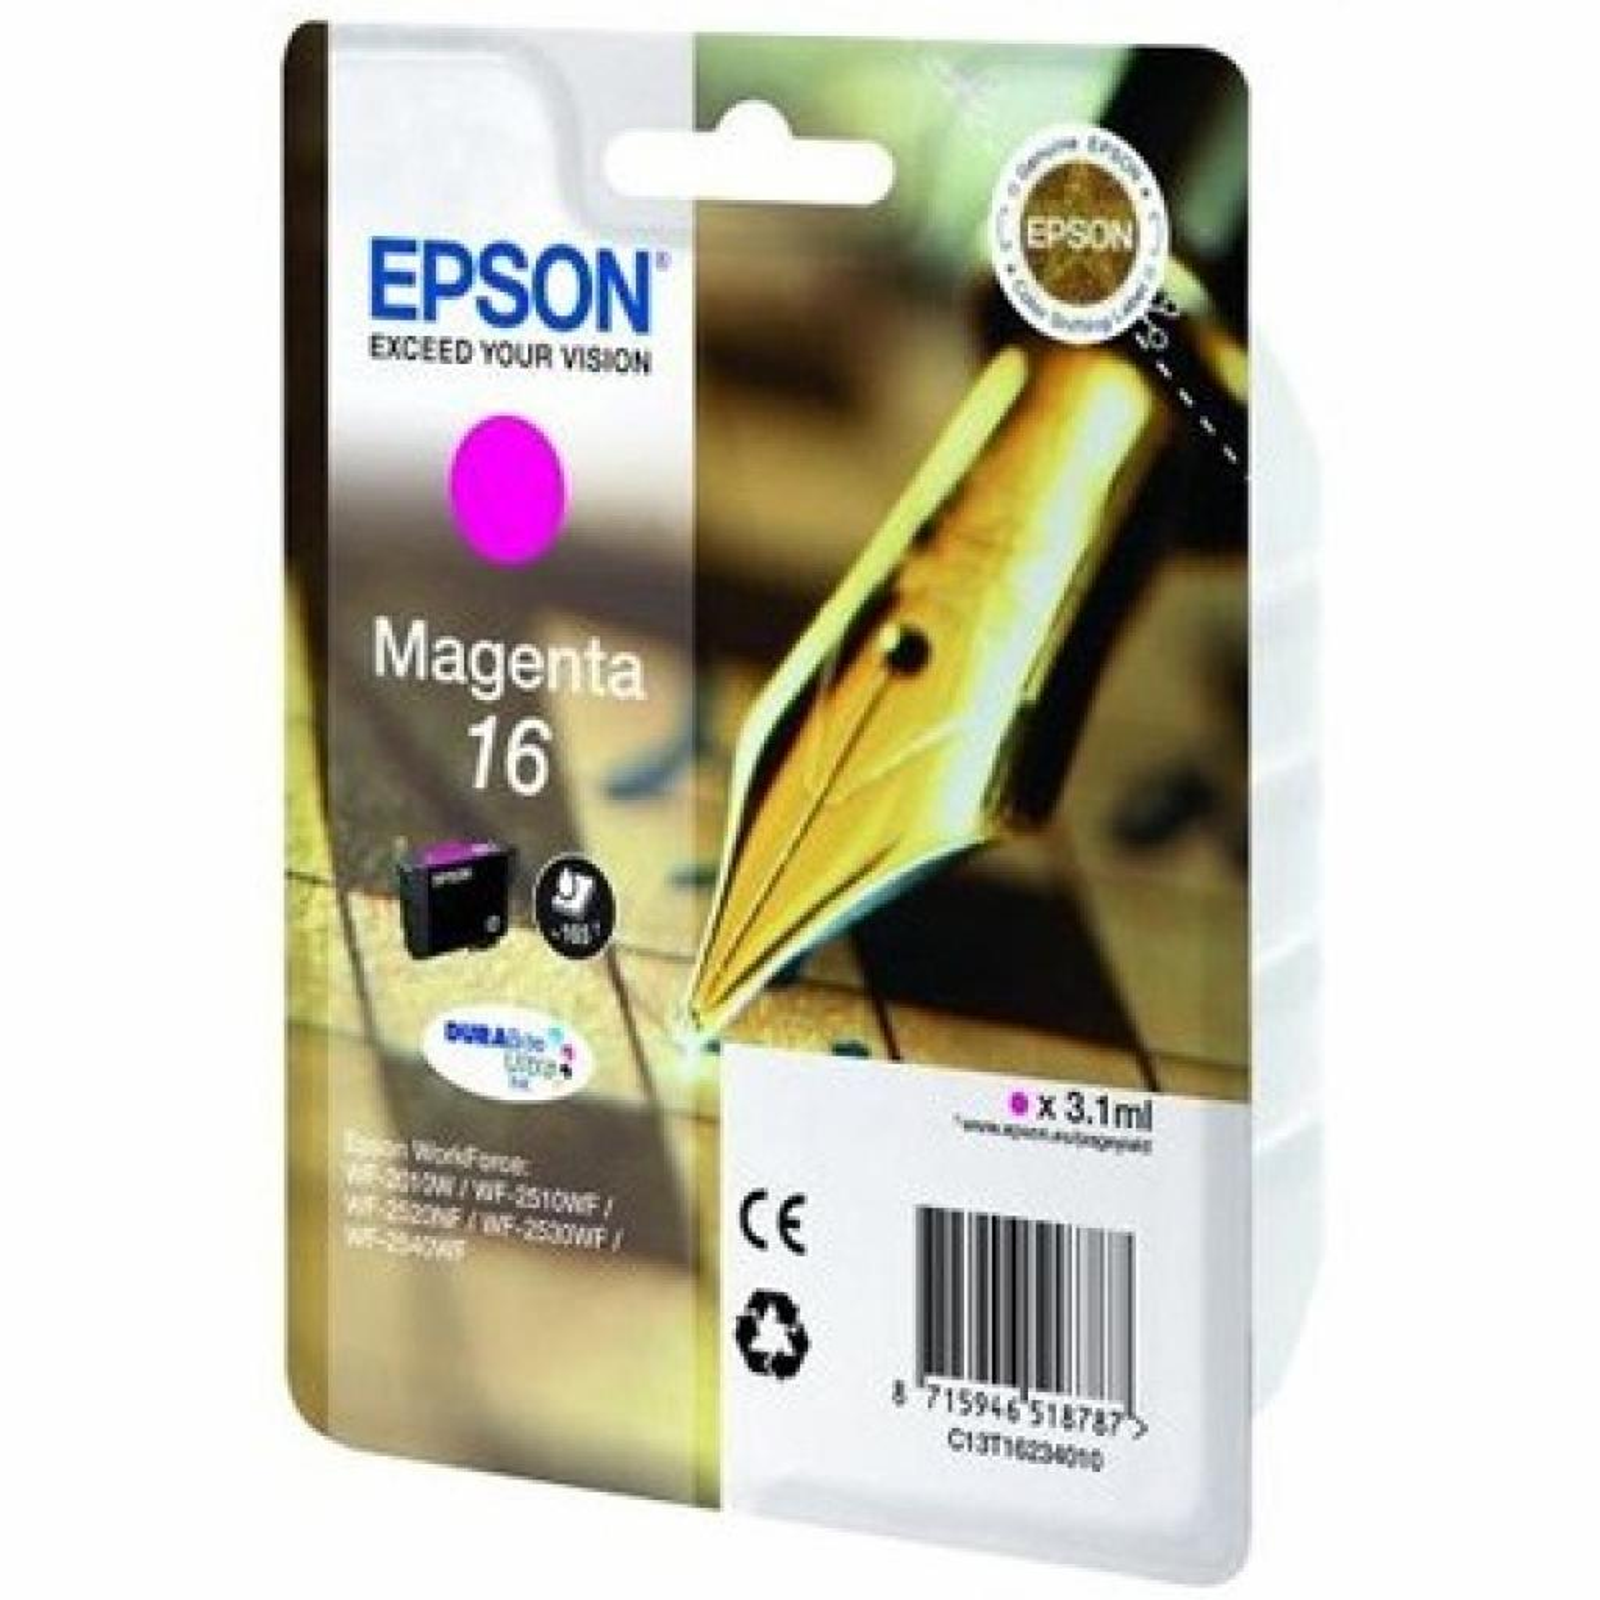 Картридж EPSON 16 WF-2010 magenta (C13T16234010)